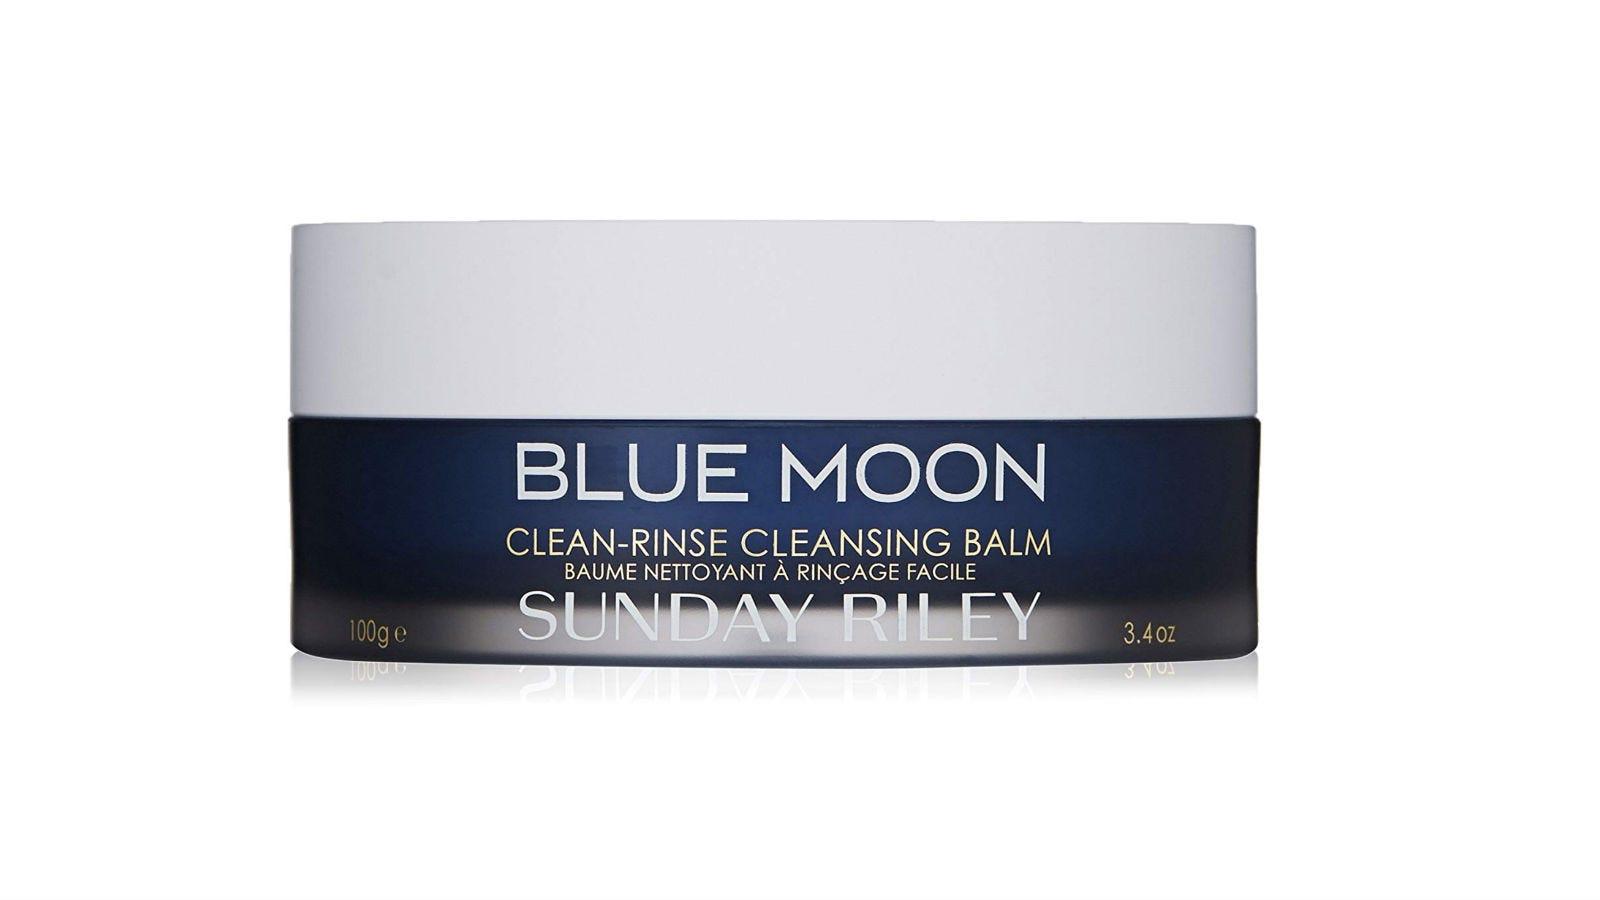 sunday riley blue moon